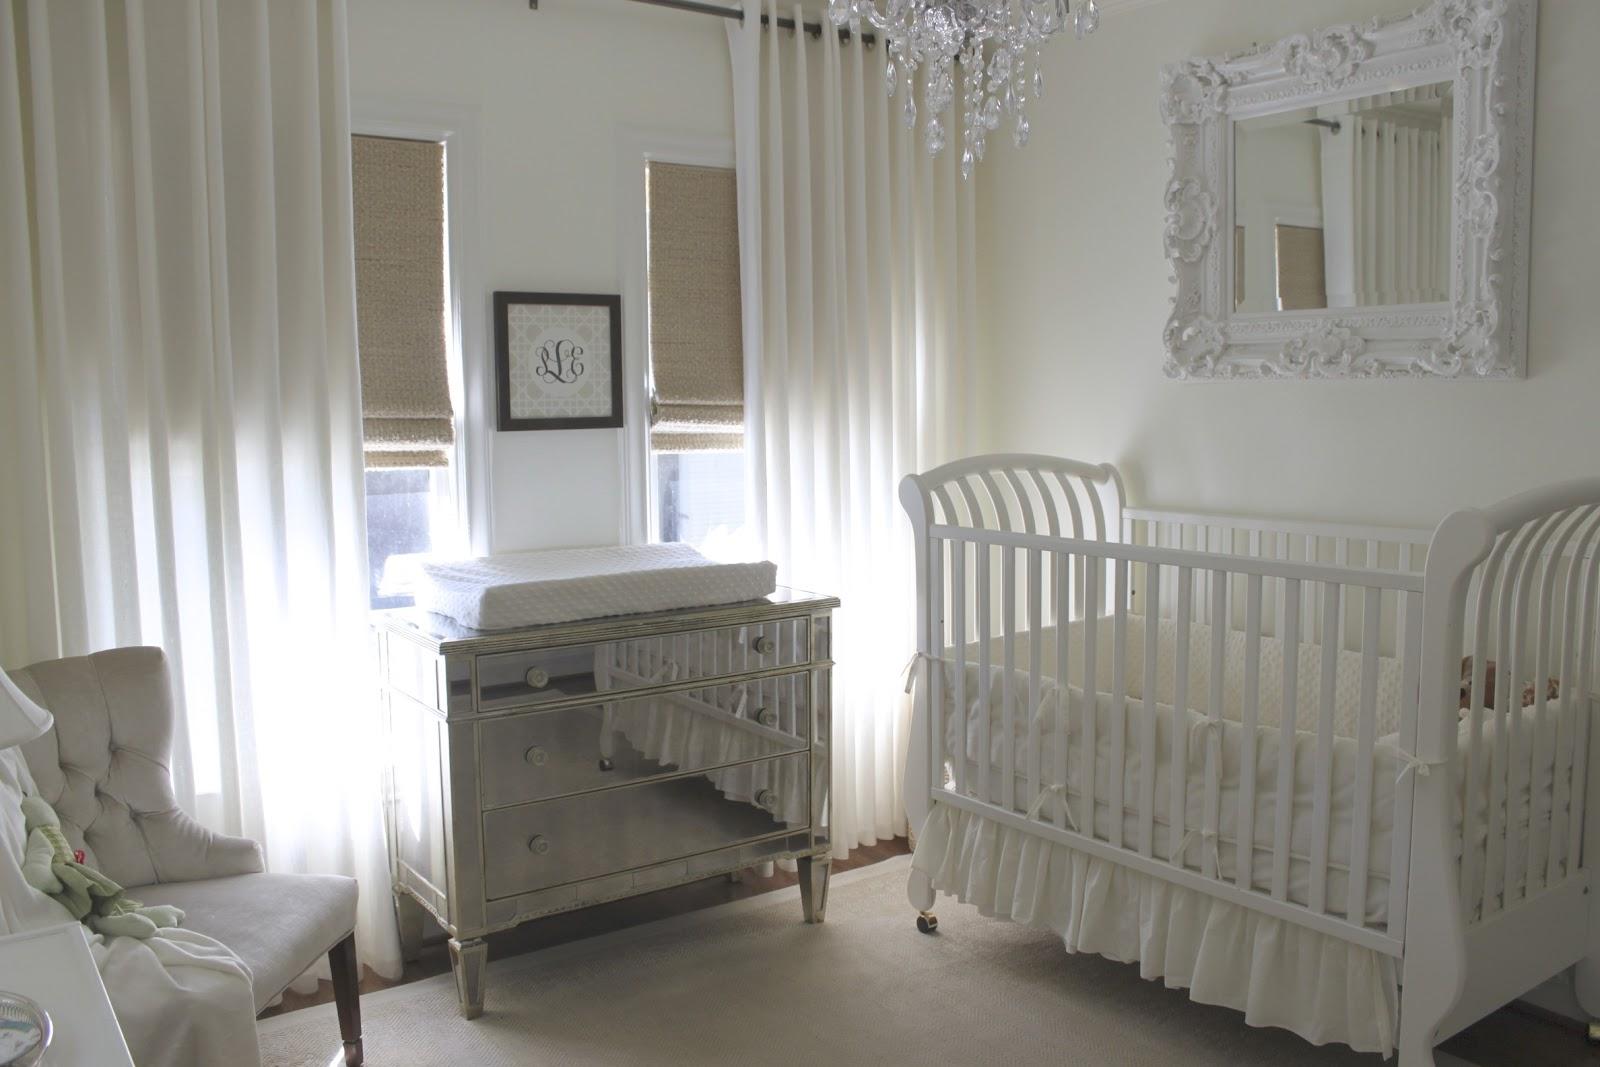 Decorgreat: Baby Girl's Nursery